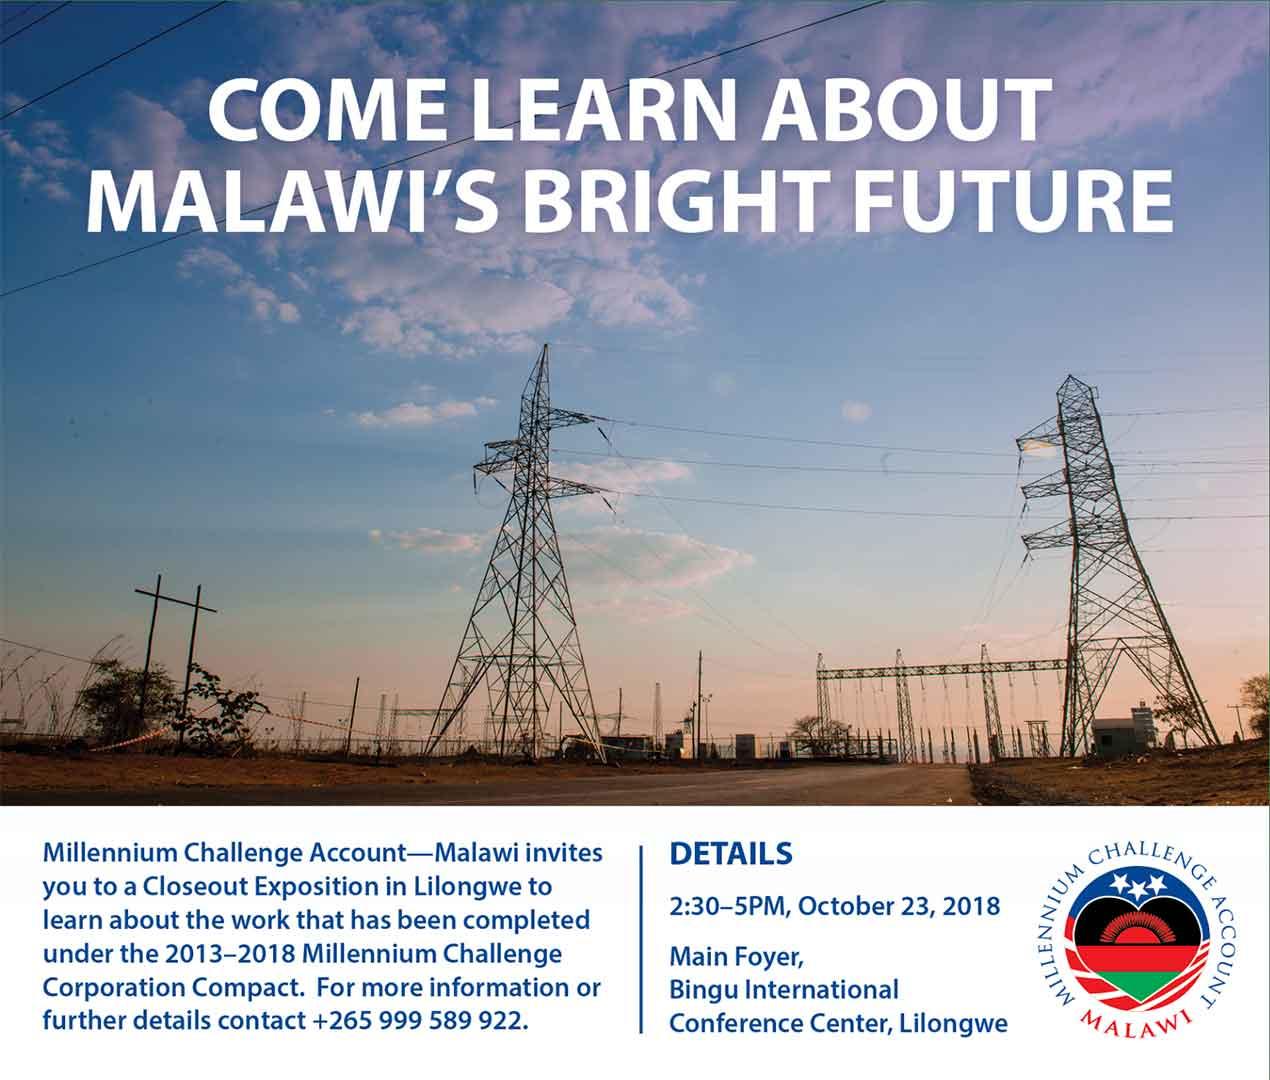 MCA Malawi